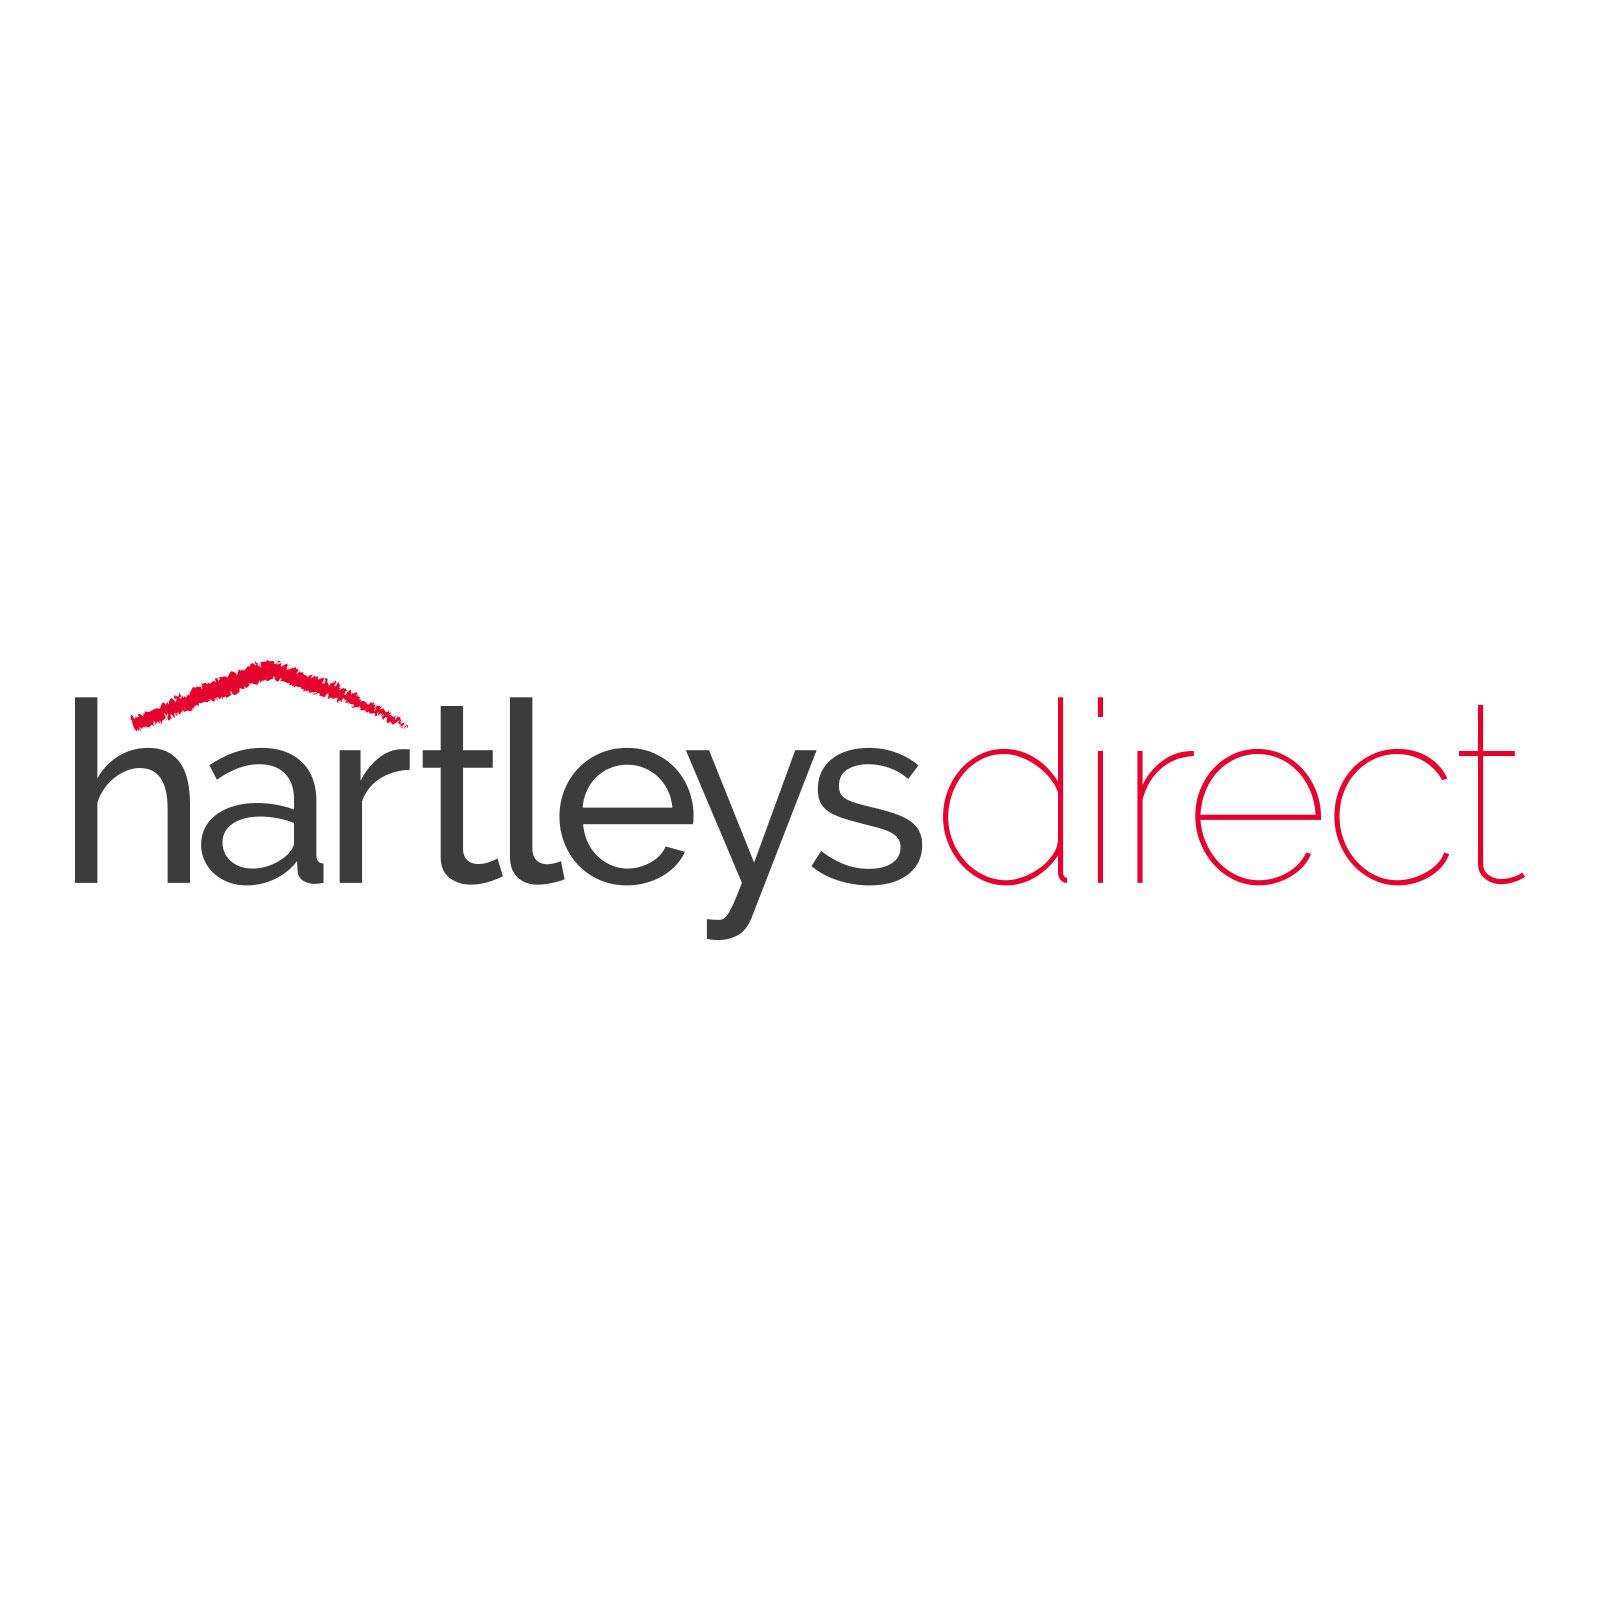 Hartleys-Industrial-Cross-Table-Legs-on-a-White-Background.jpg